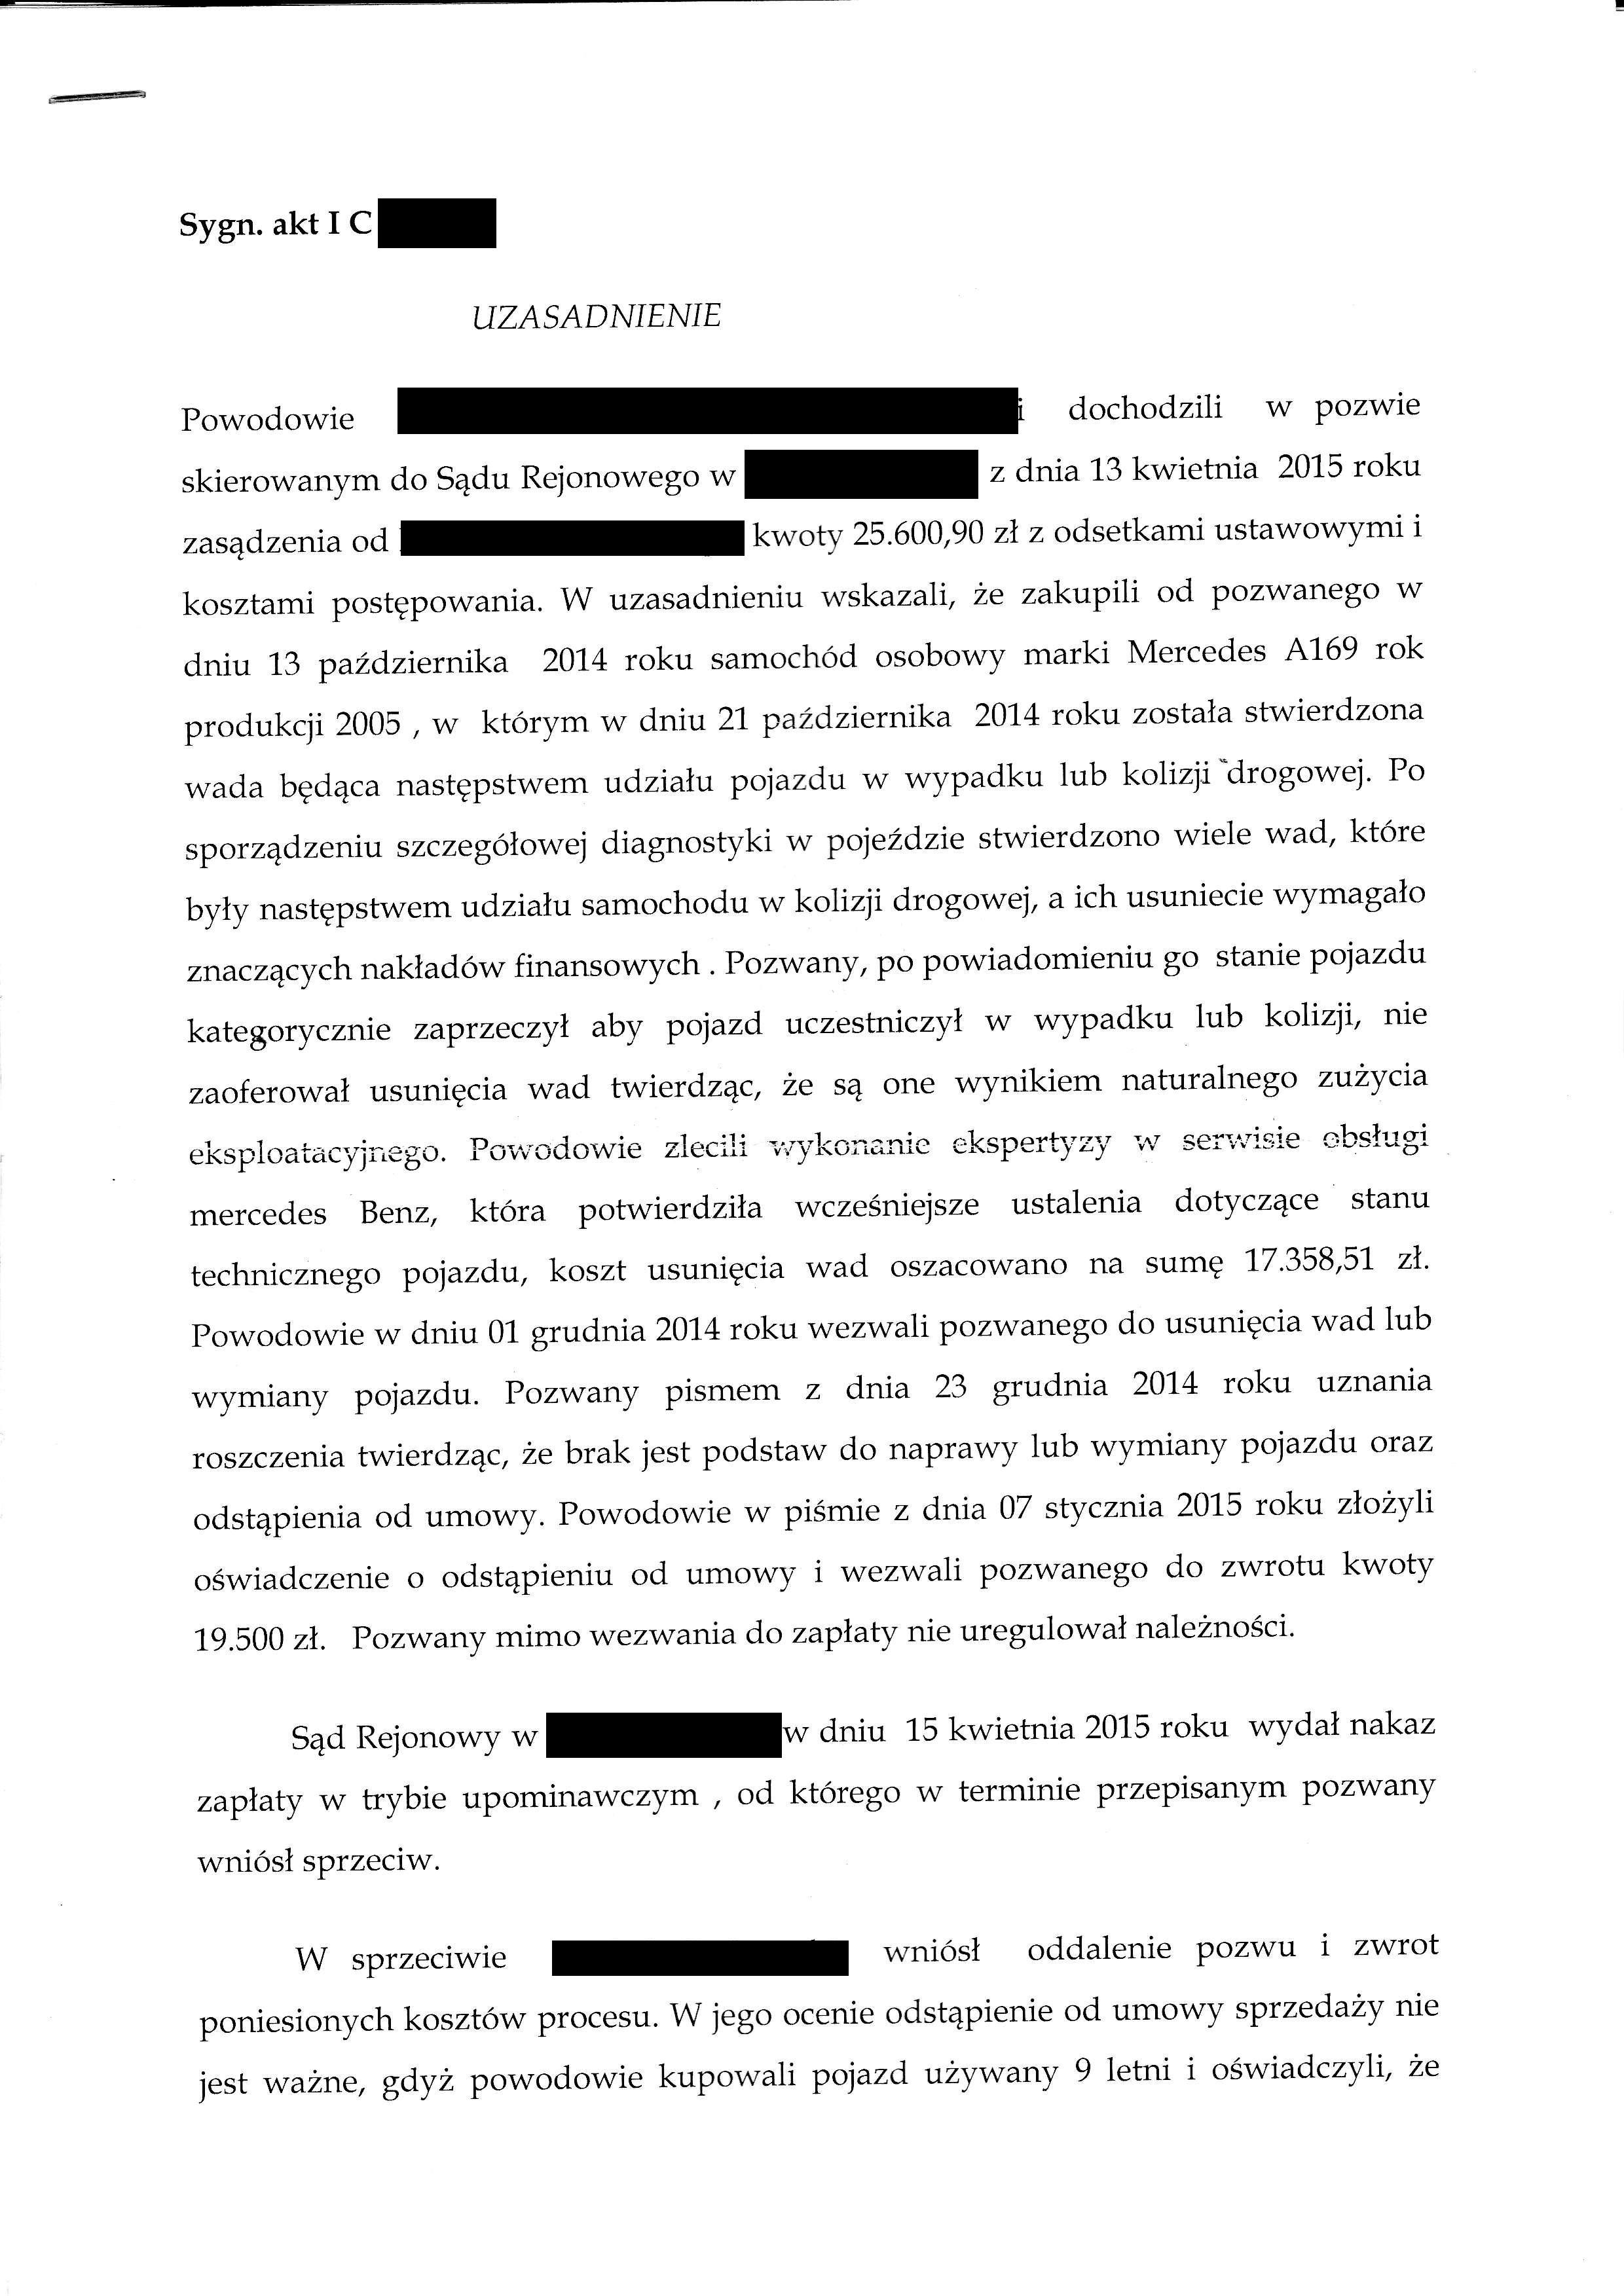 R. pr. Mateusz Hańderek MH LEGAL skan_5